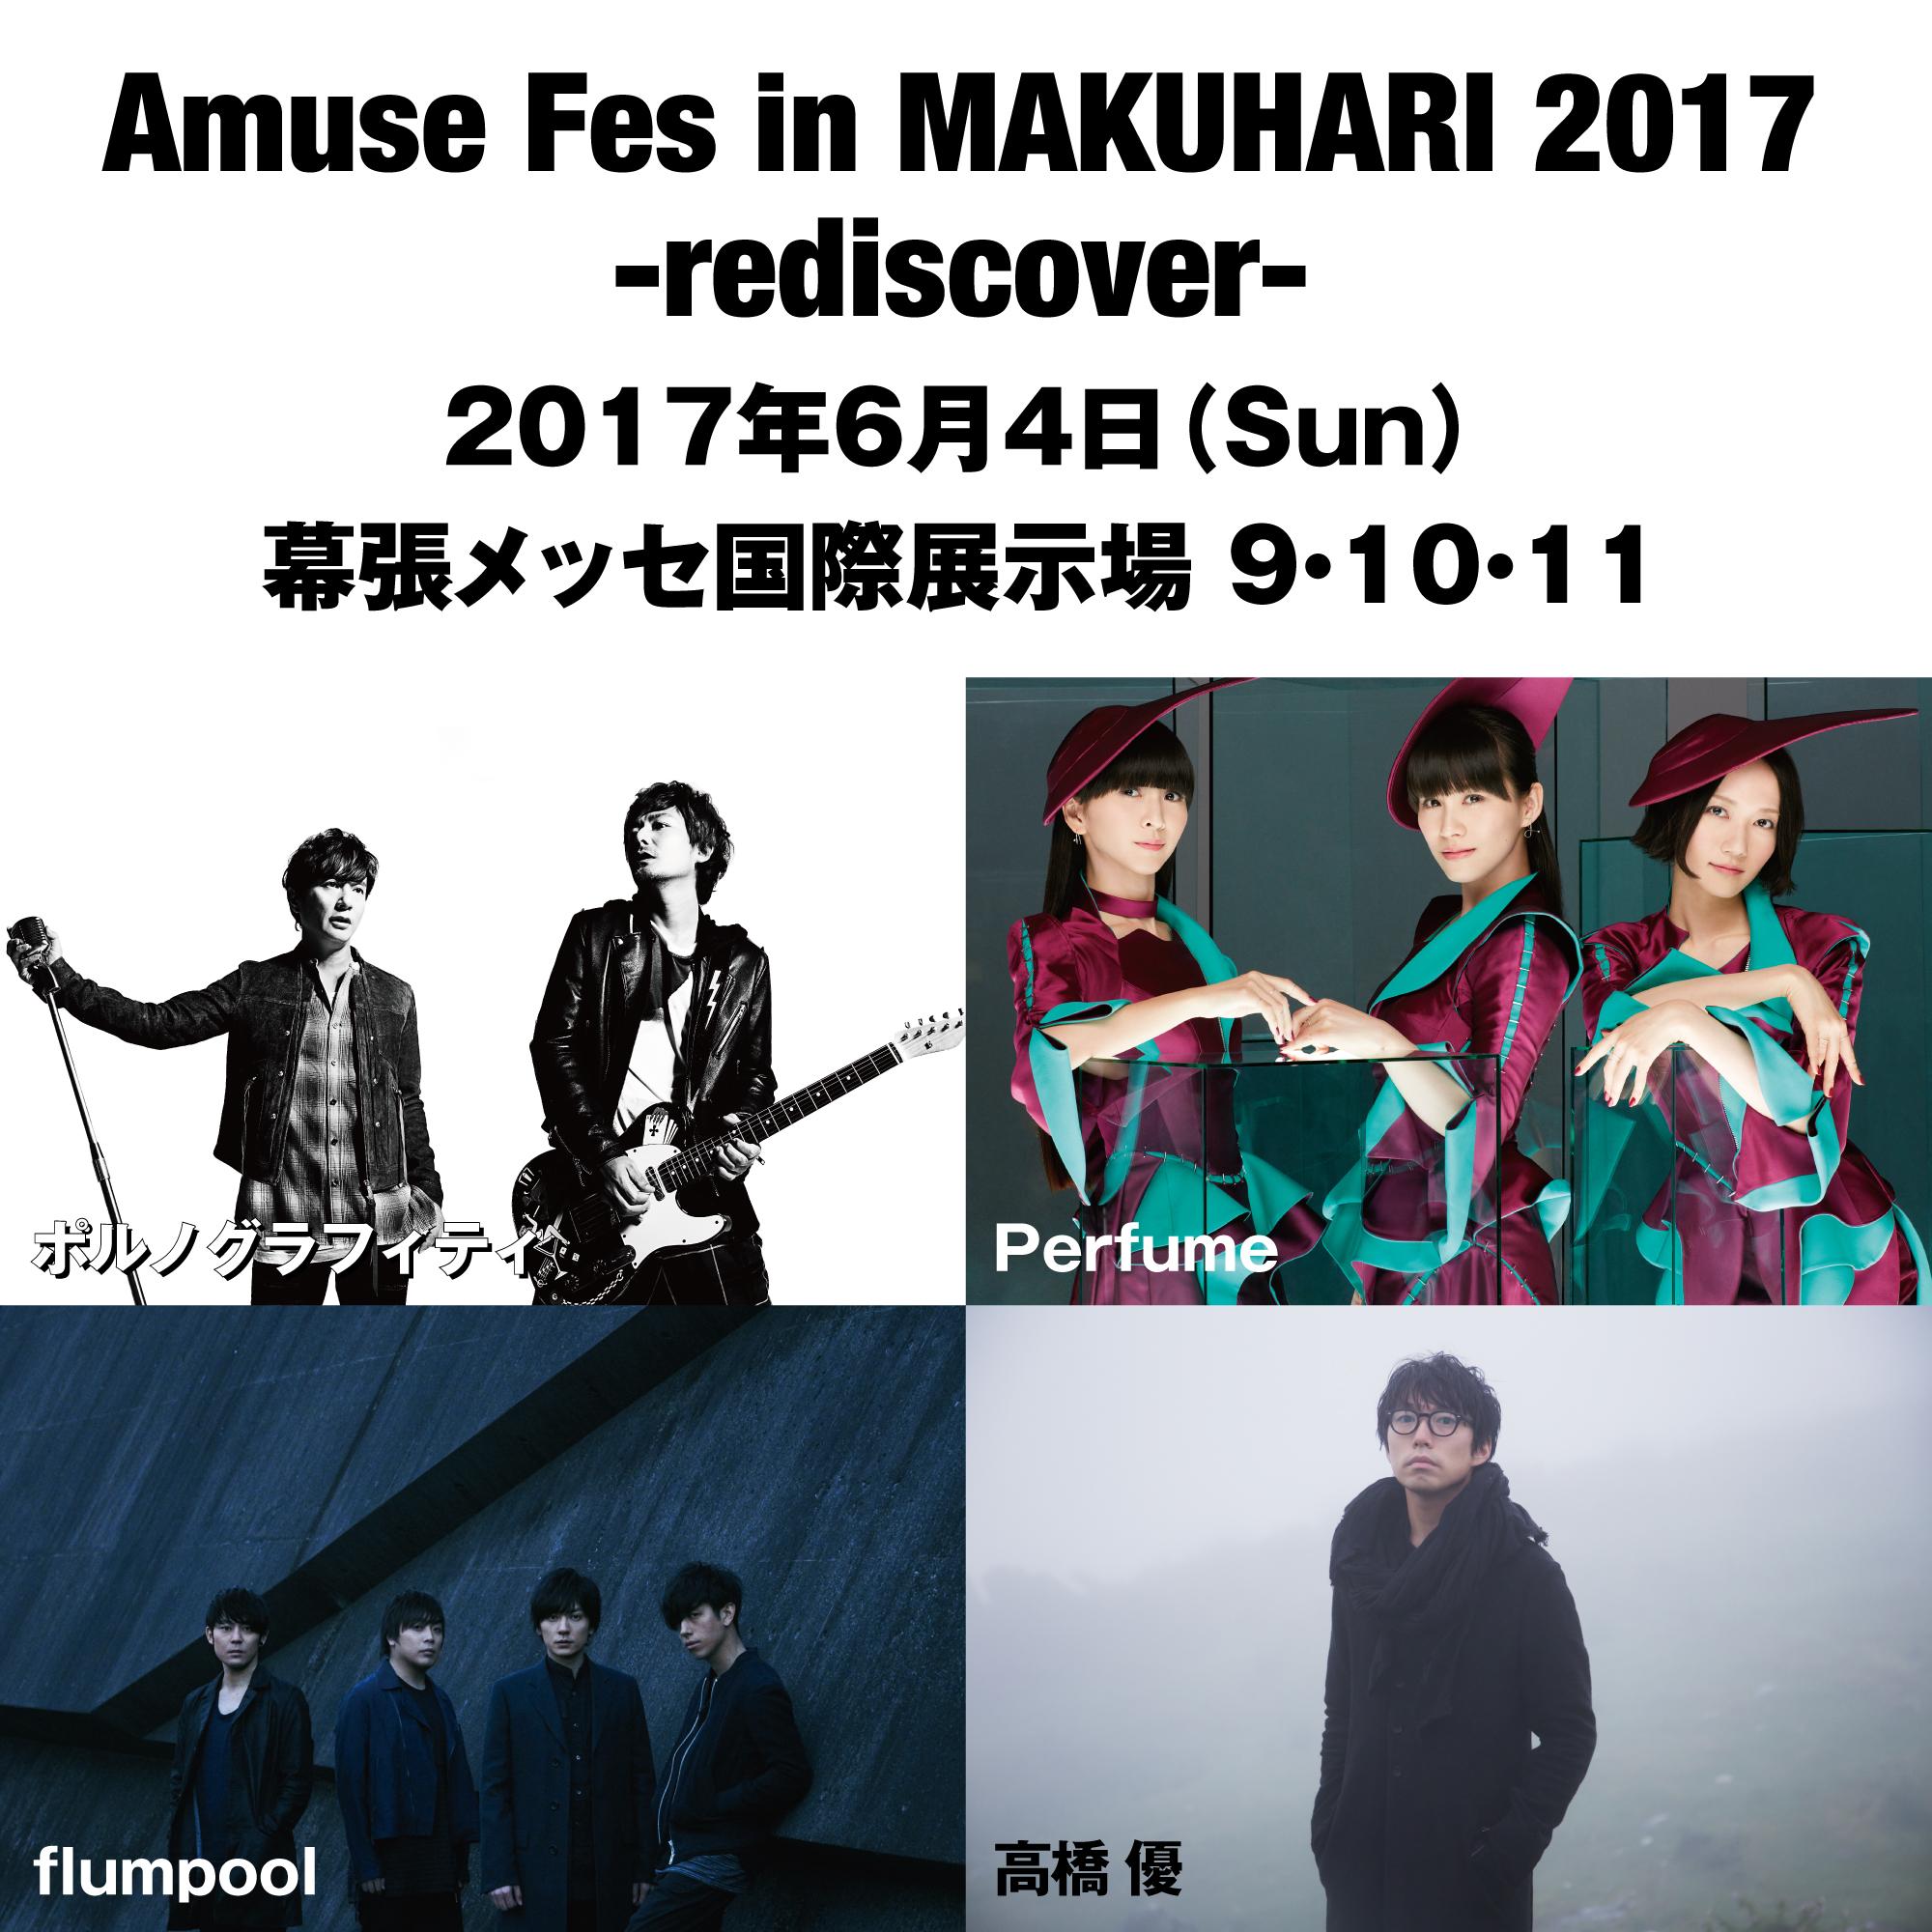 『Amuse Fes in MAKUHARI 2017  – rediscover -』告知画像